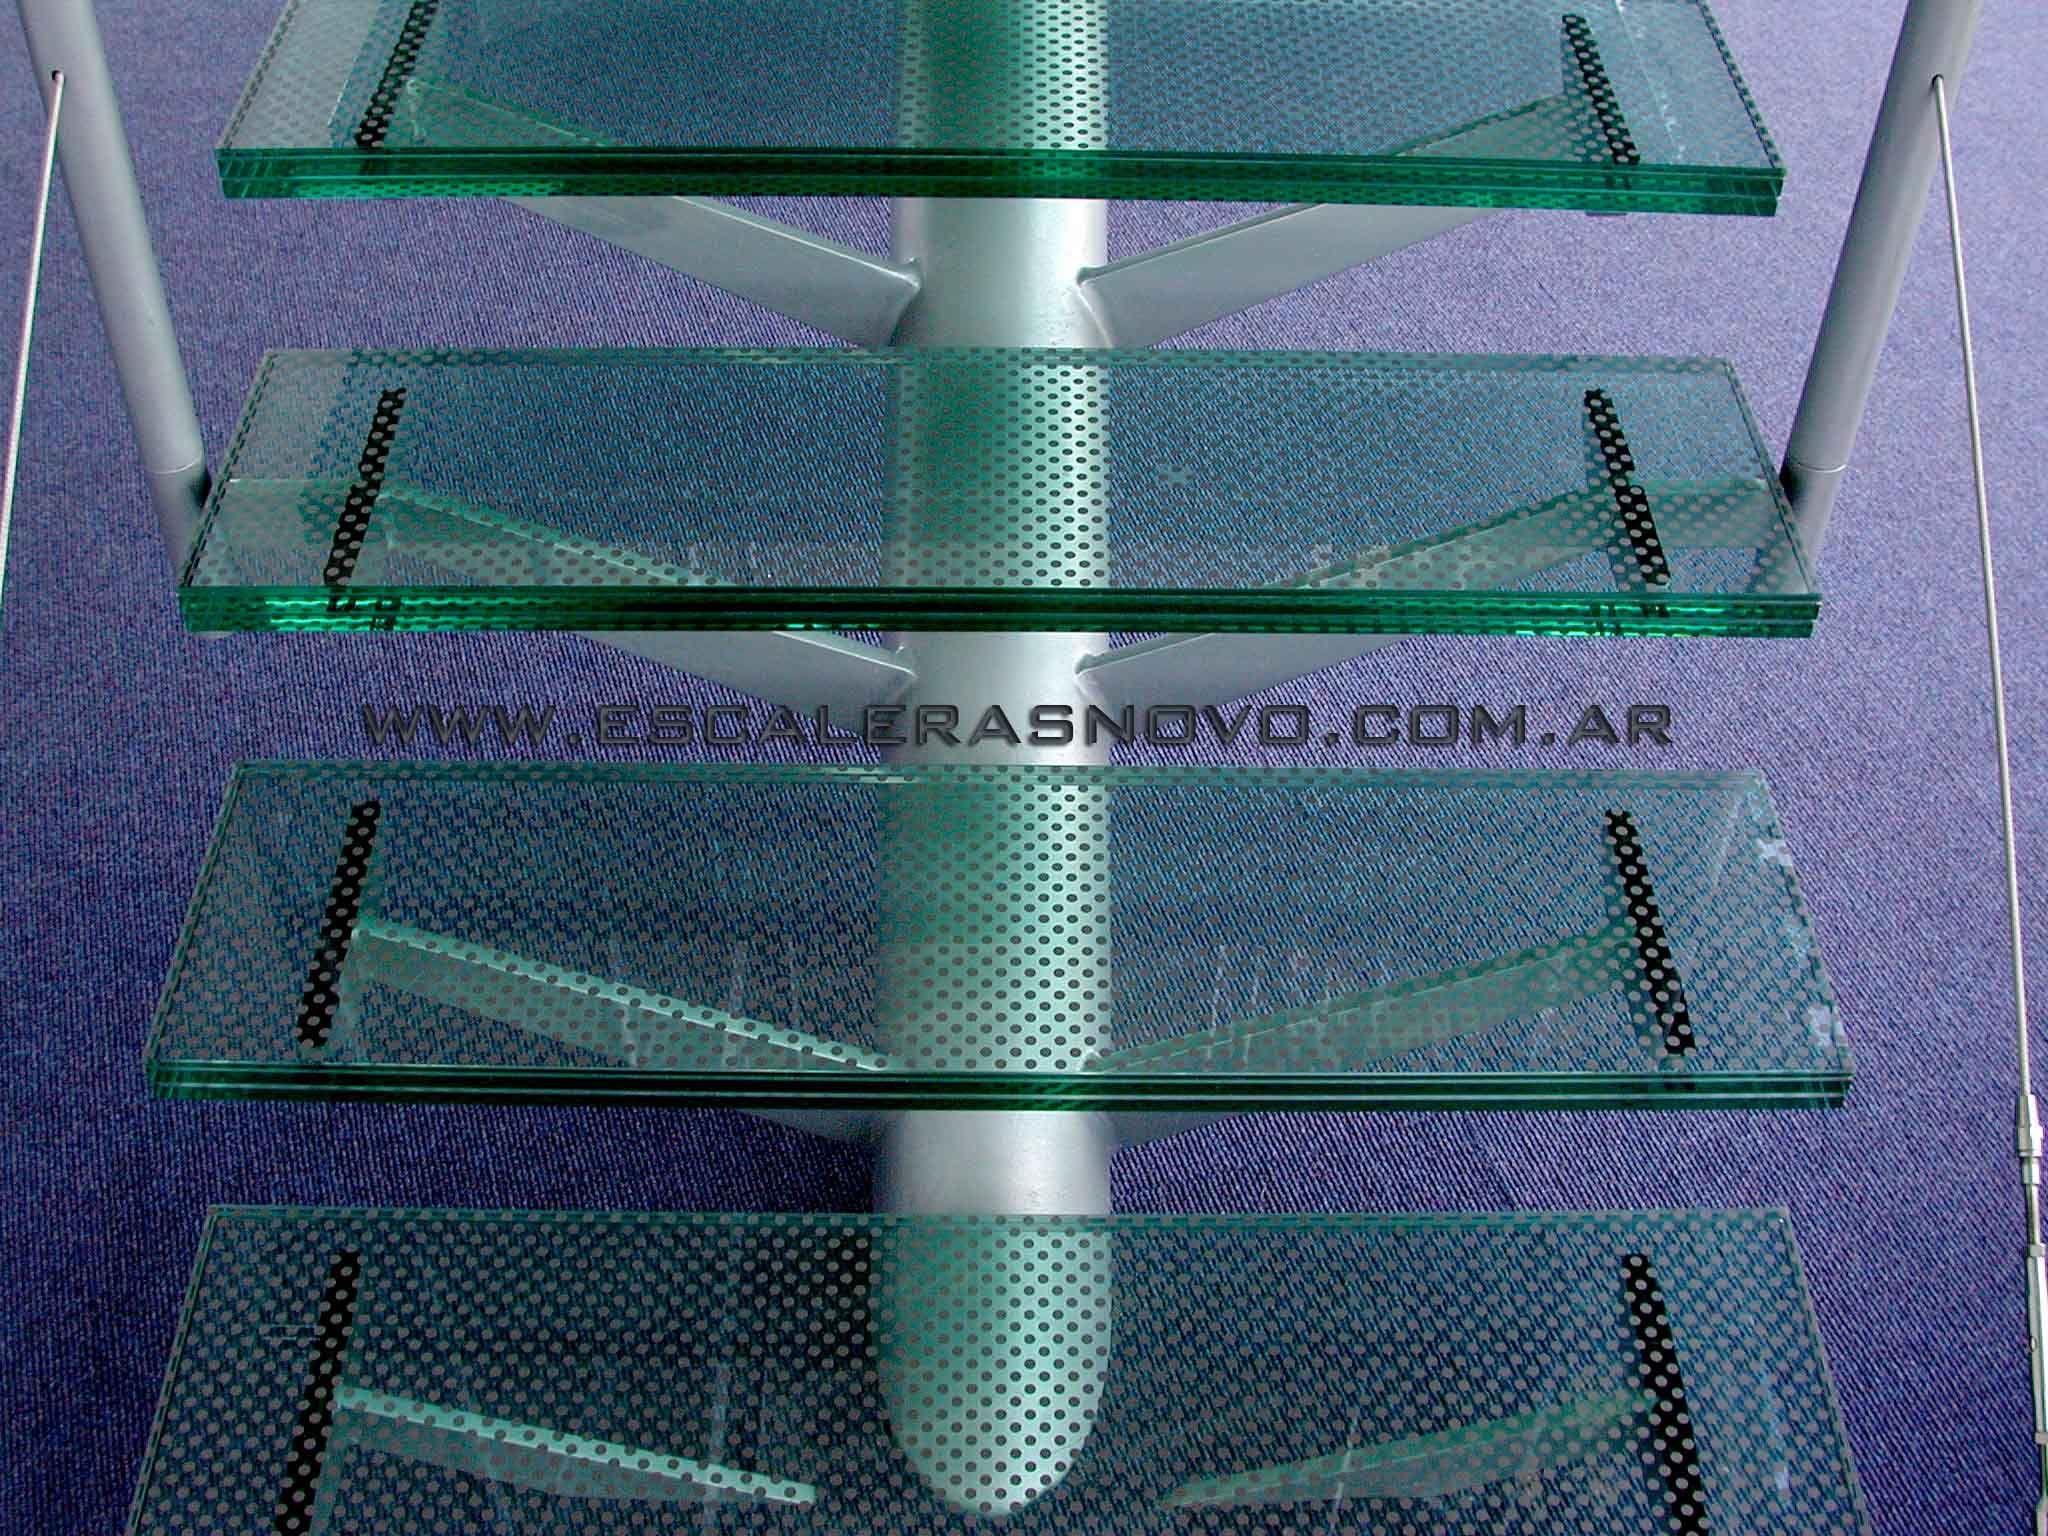 Escalera de vidrio venta de escaleras y barandas novo for Barandas de escalera